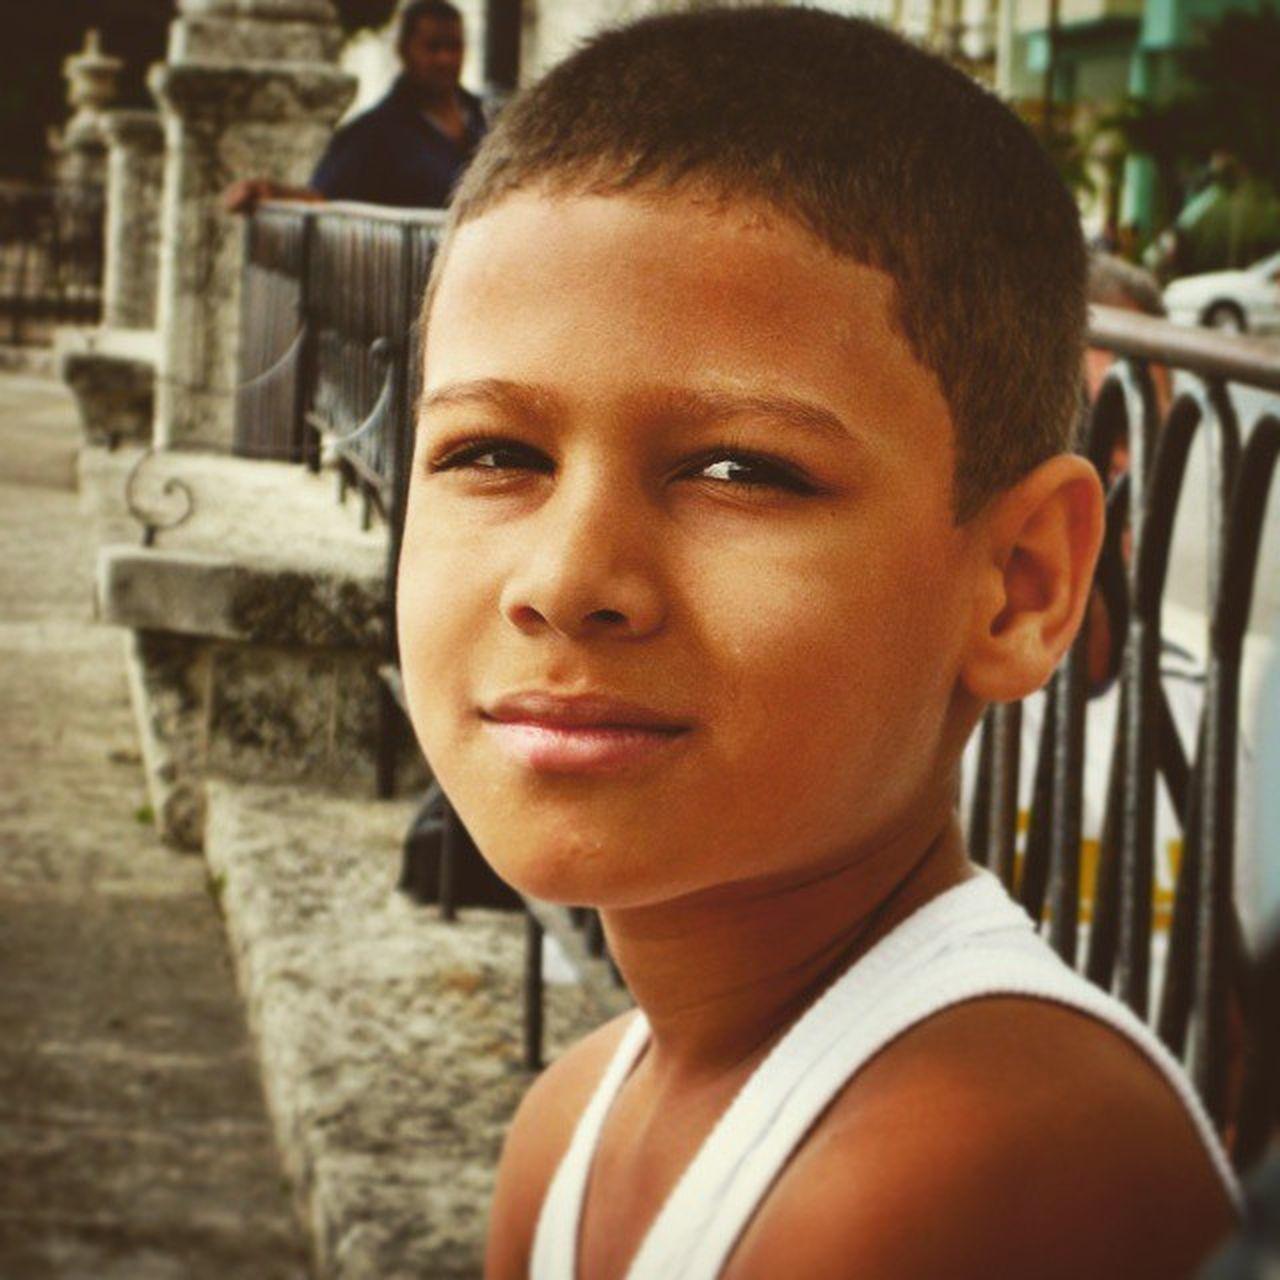 Cuba Cubanito Niño Lindo  Cubano Havana LaHabana Loves_cuba Ig_cuba Barcubar